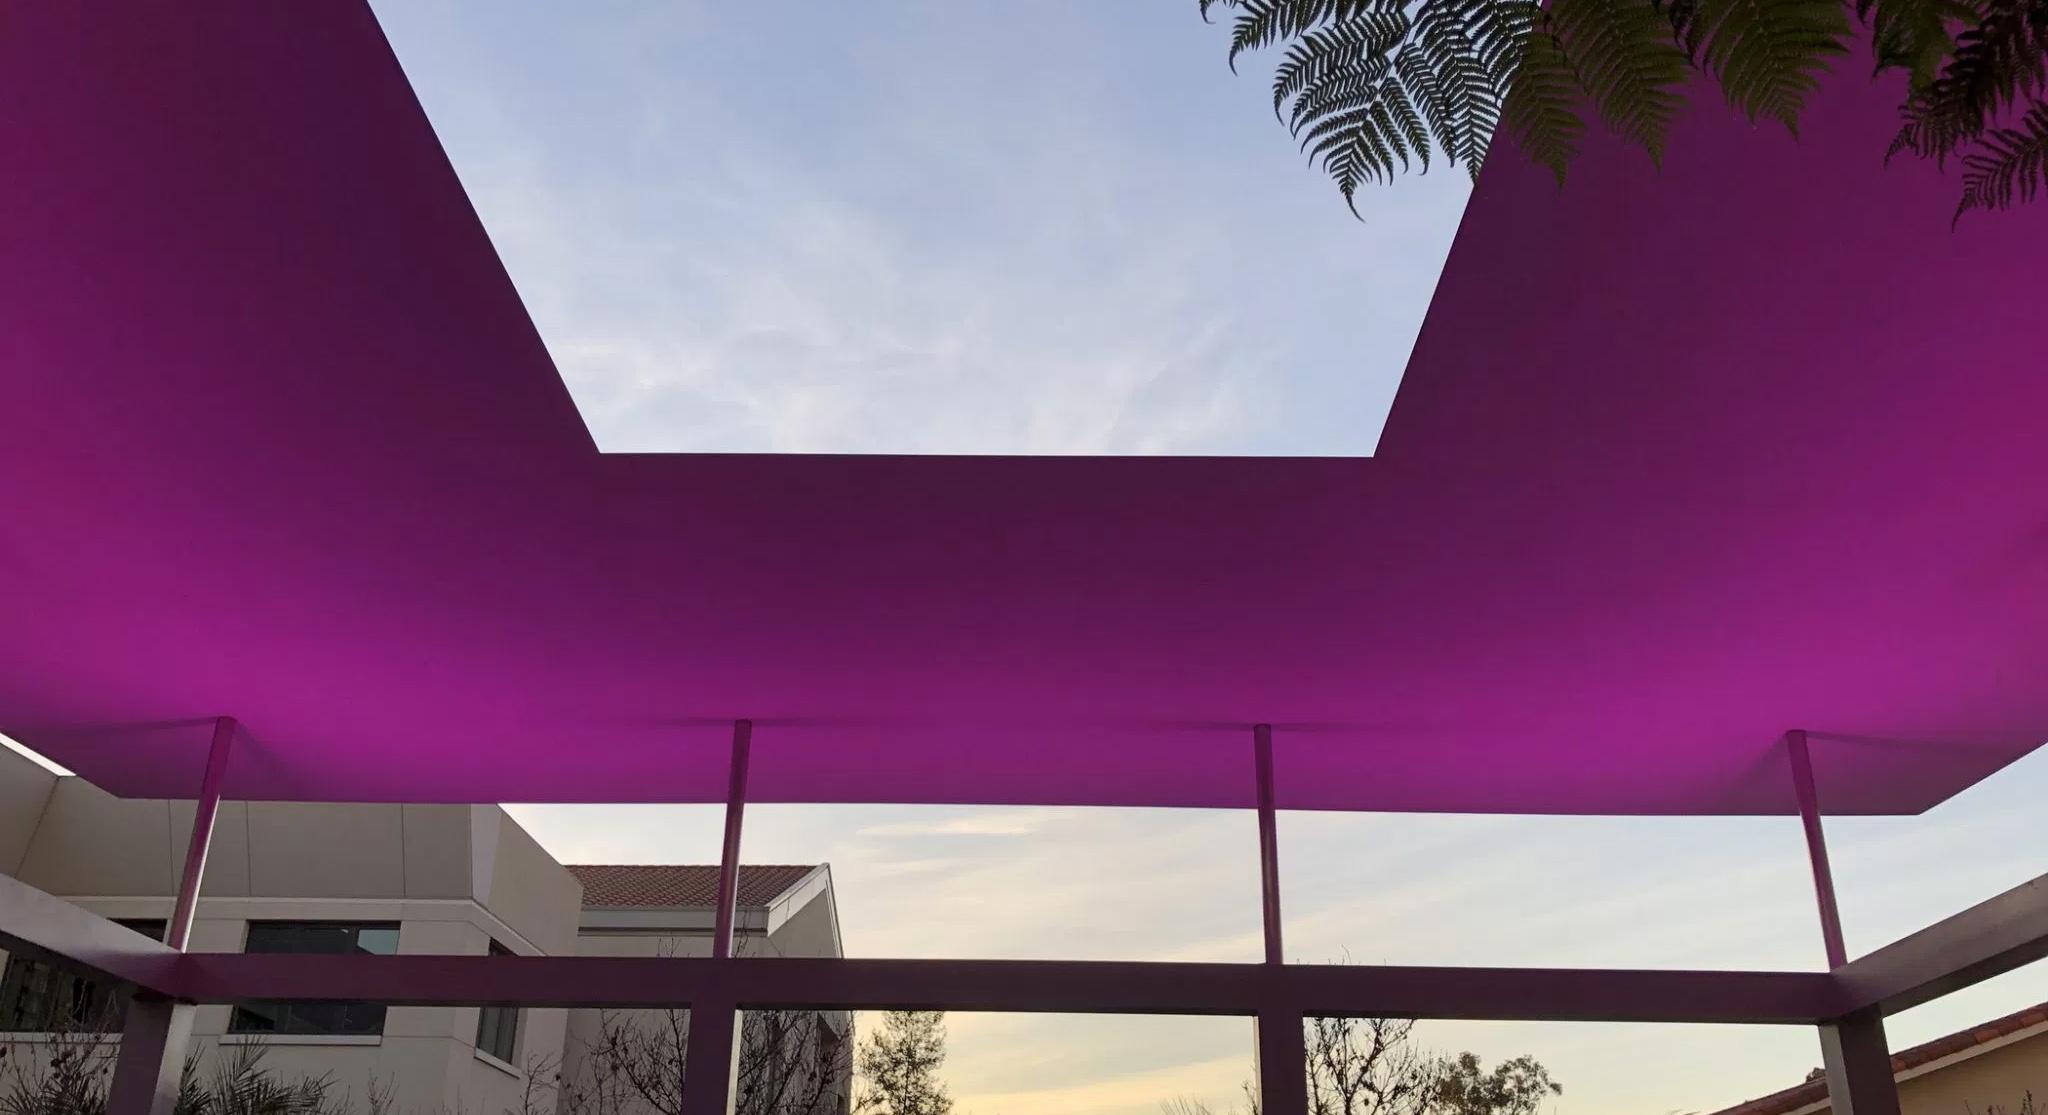 James Turrell – Dividing The Light